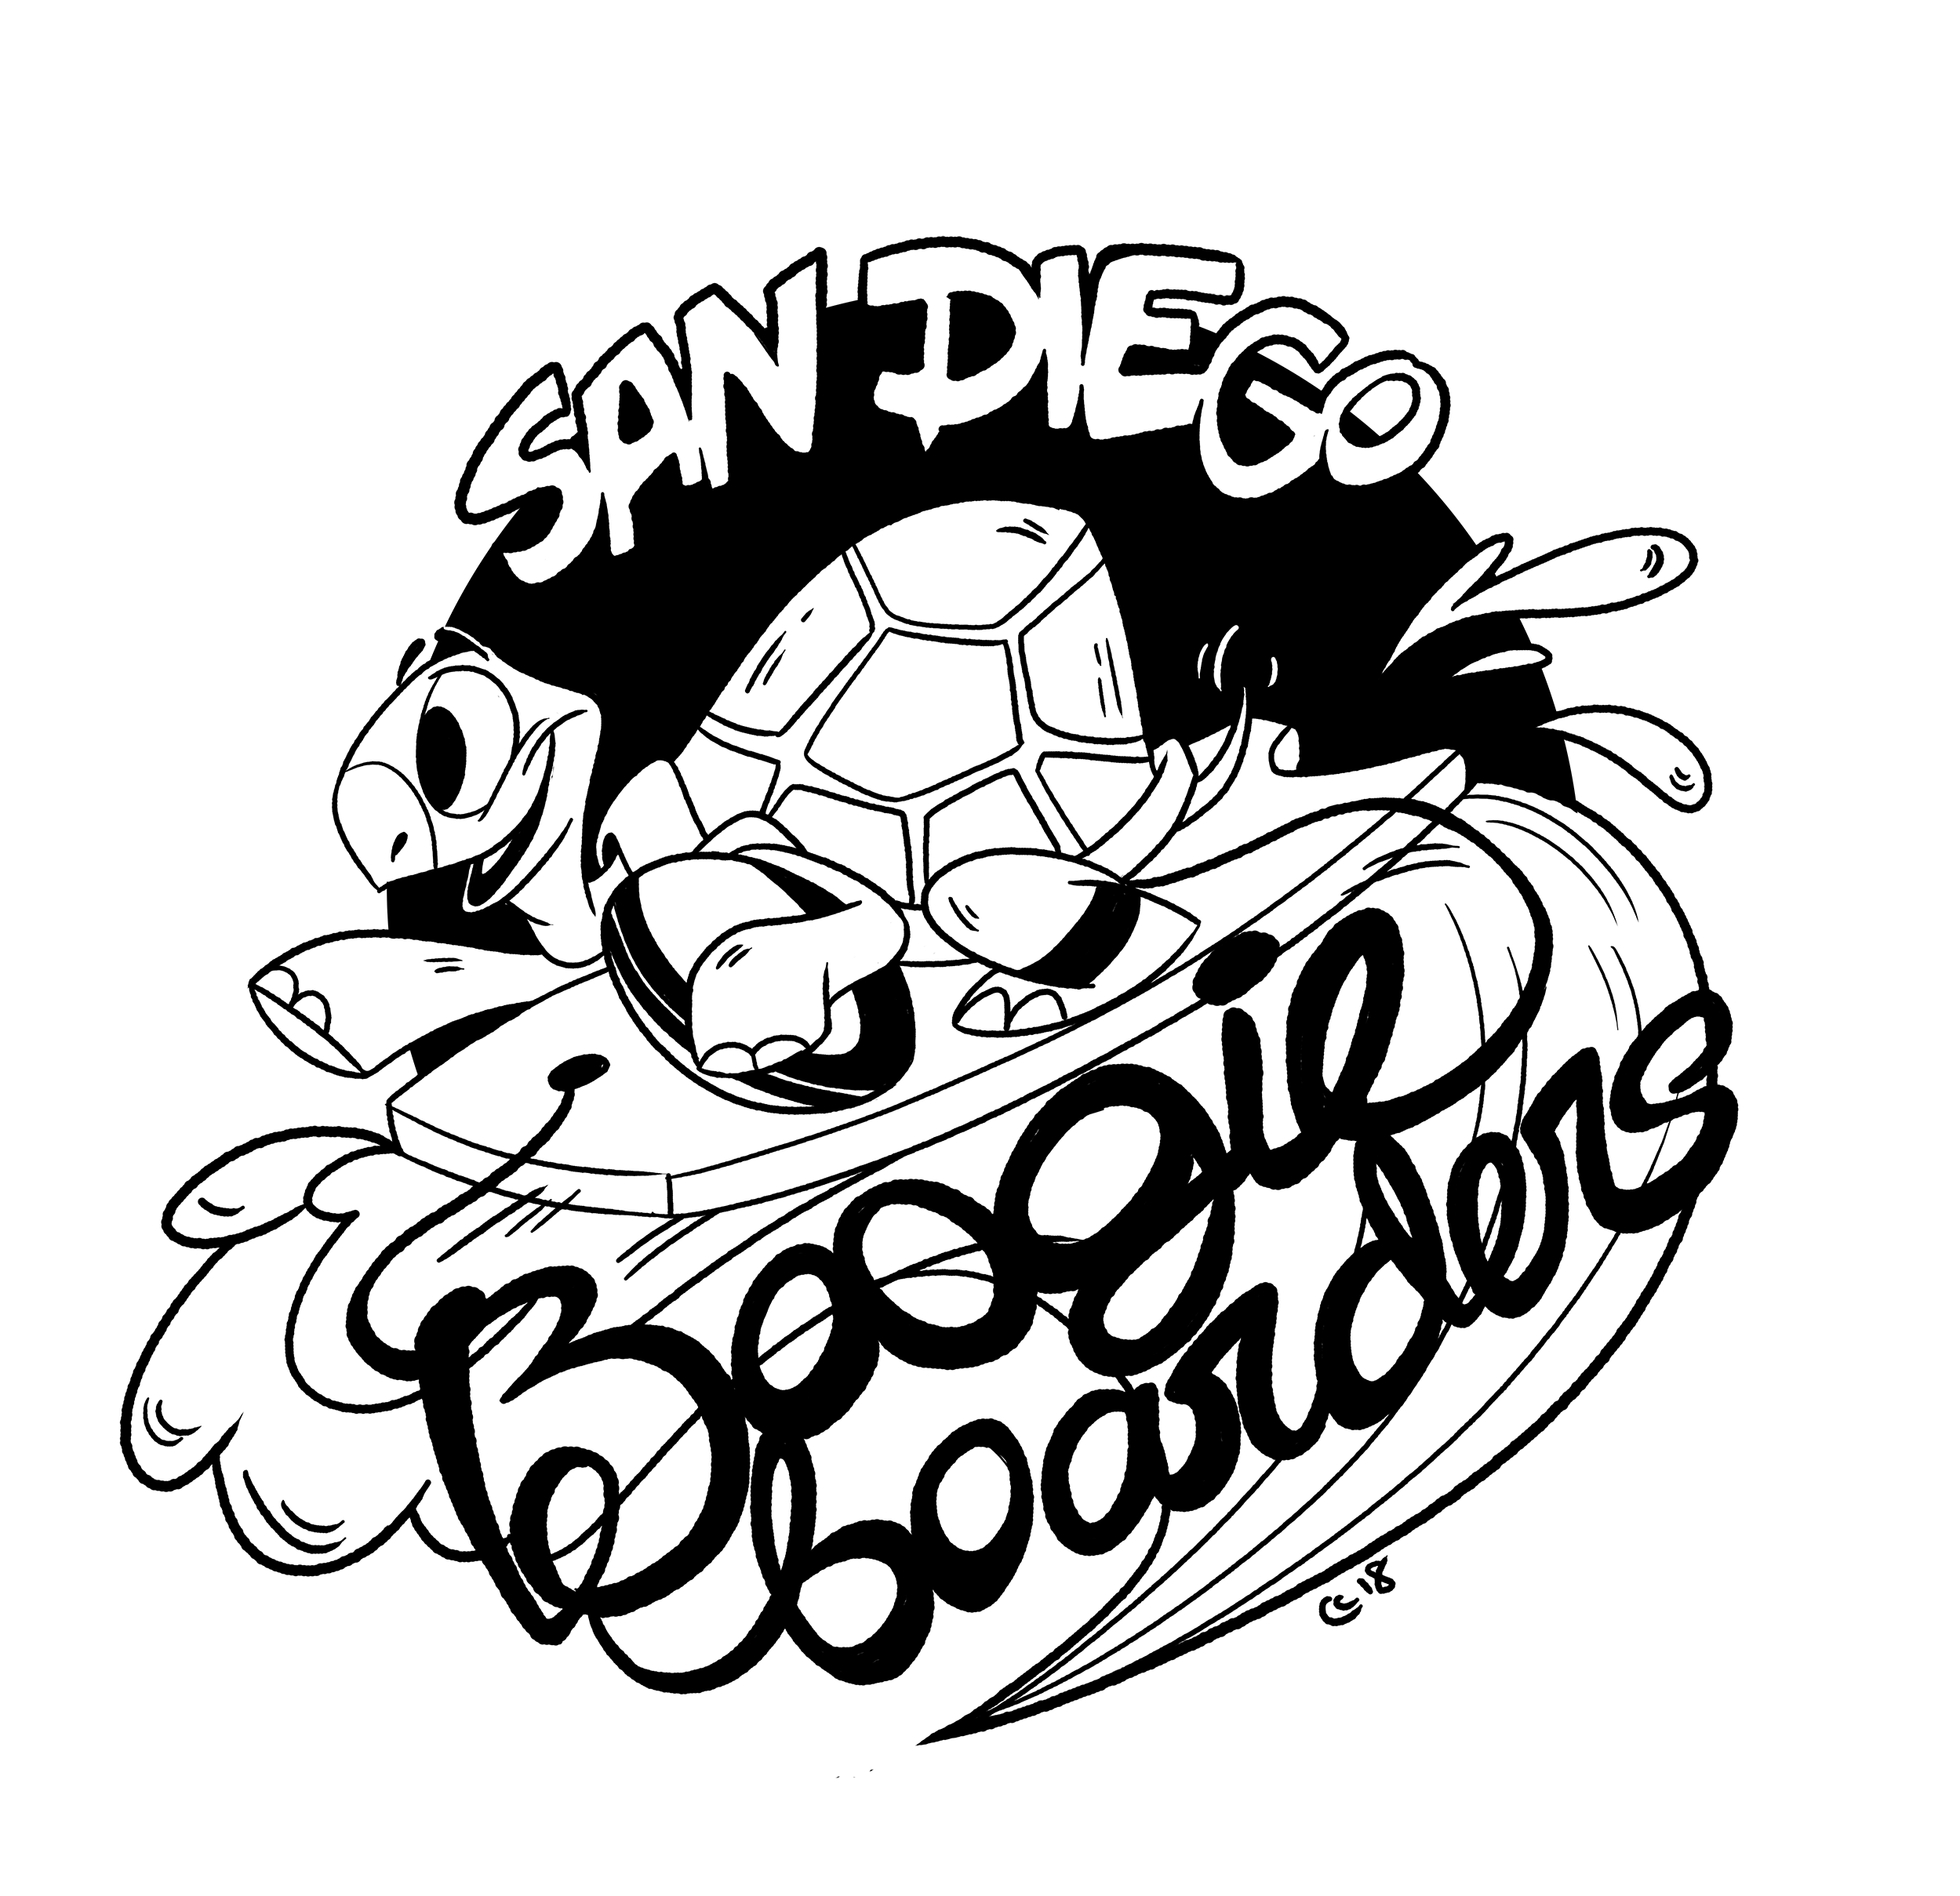 sandiego_boogieboarders_web.png